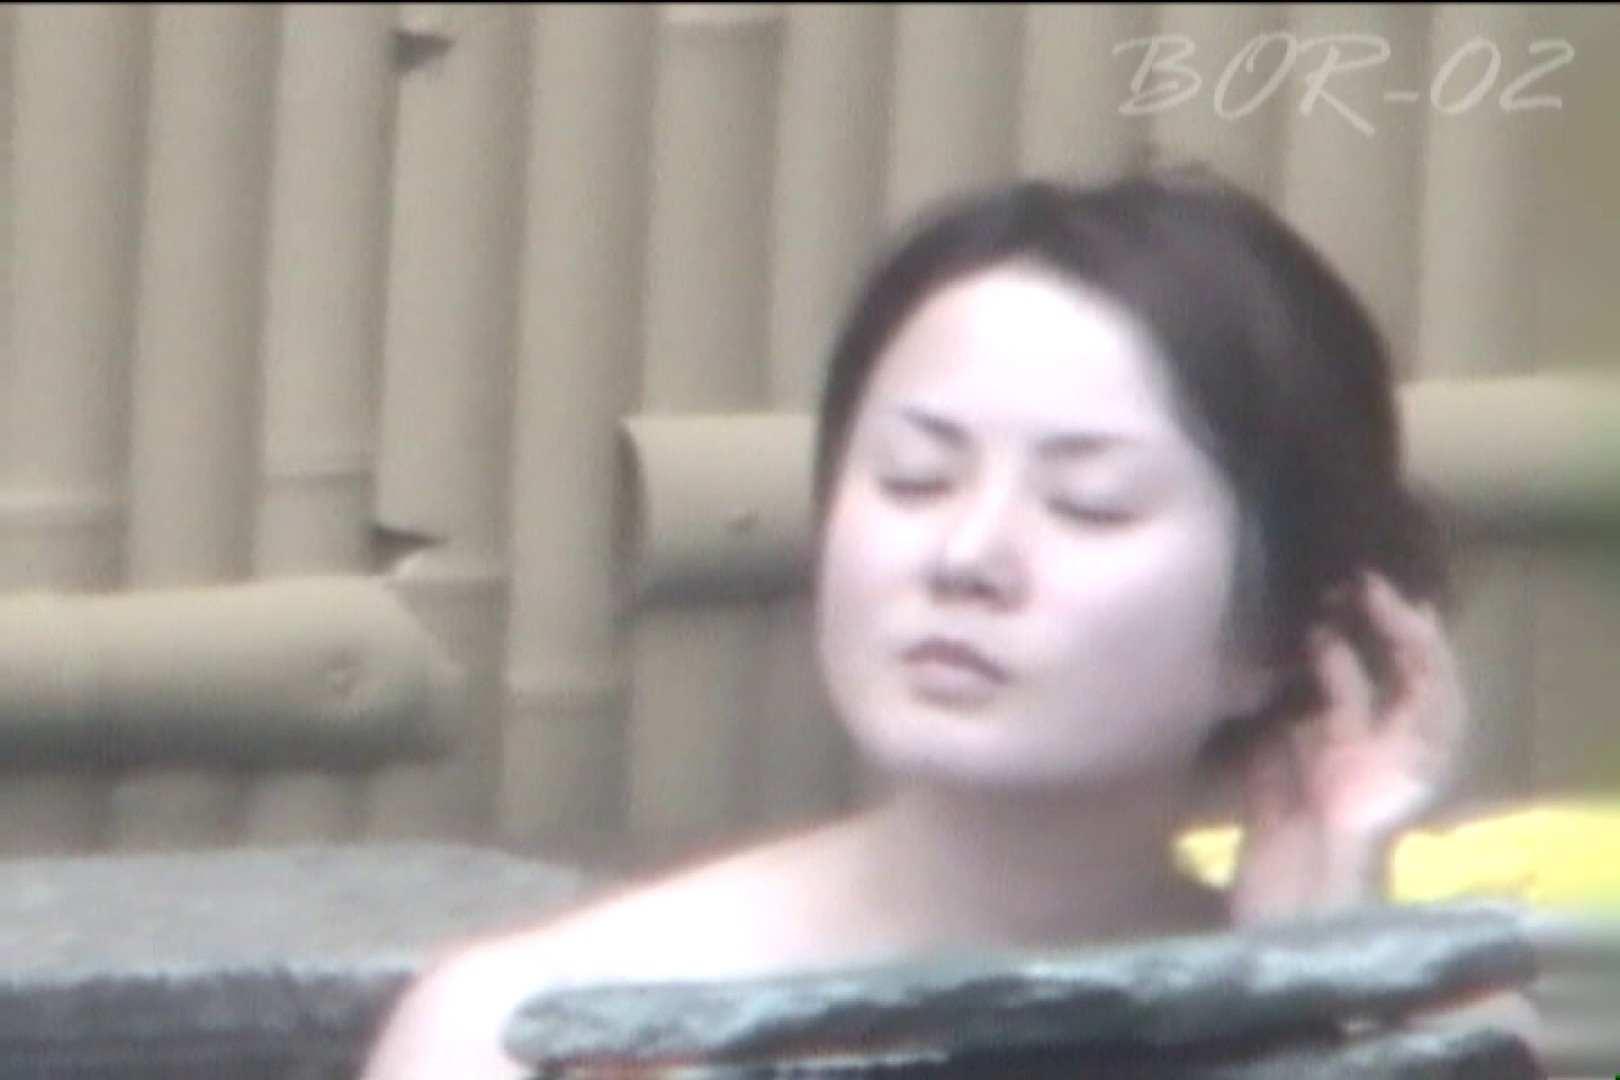 Aquaな露天風呂Vol.474 盗撮シリーズ | 露天風呂編  111PIX 3